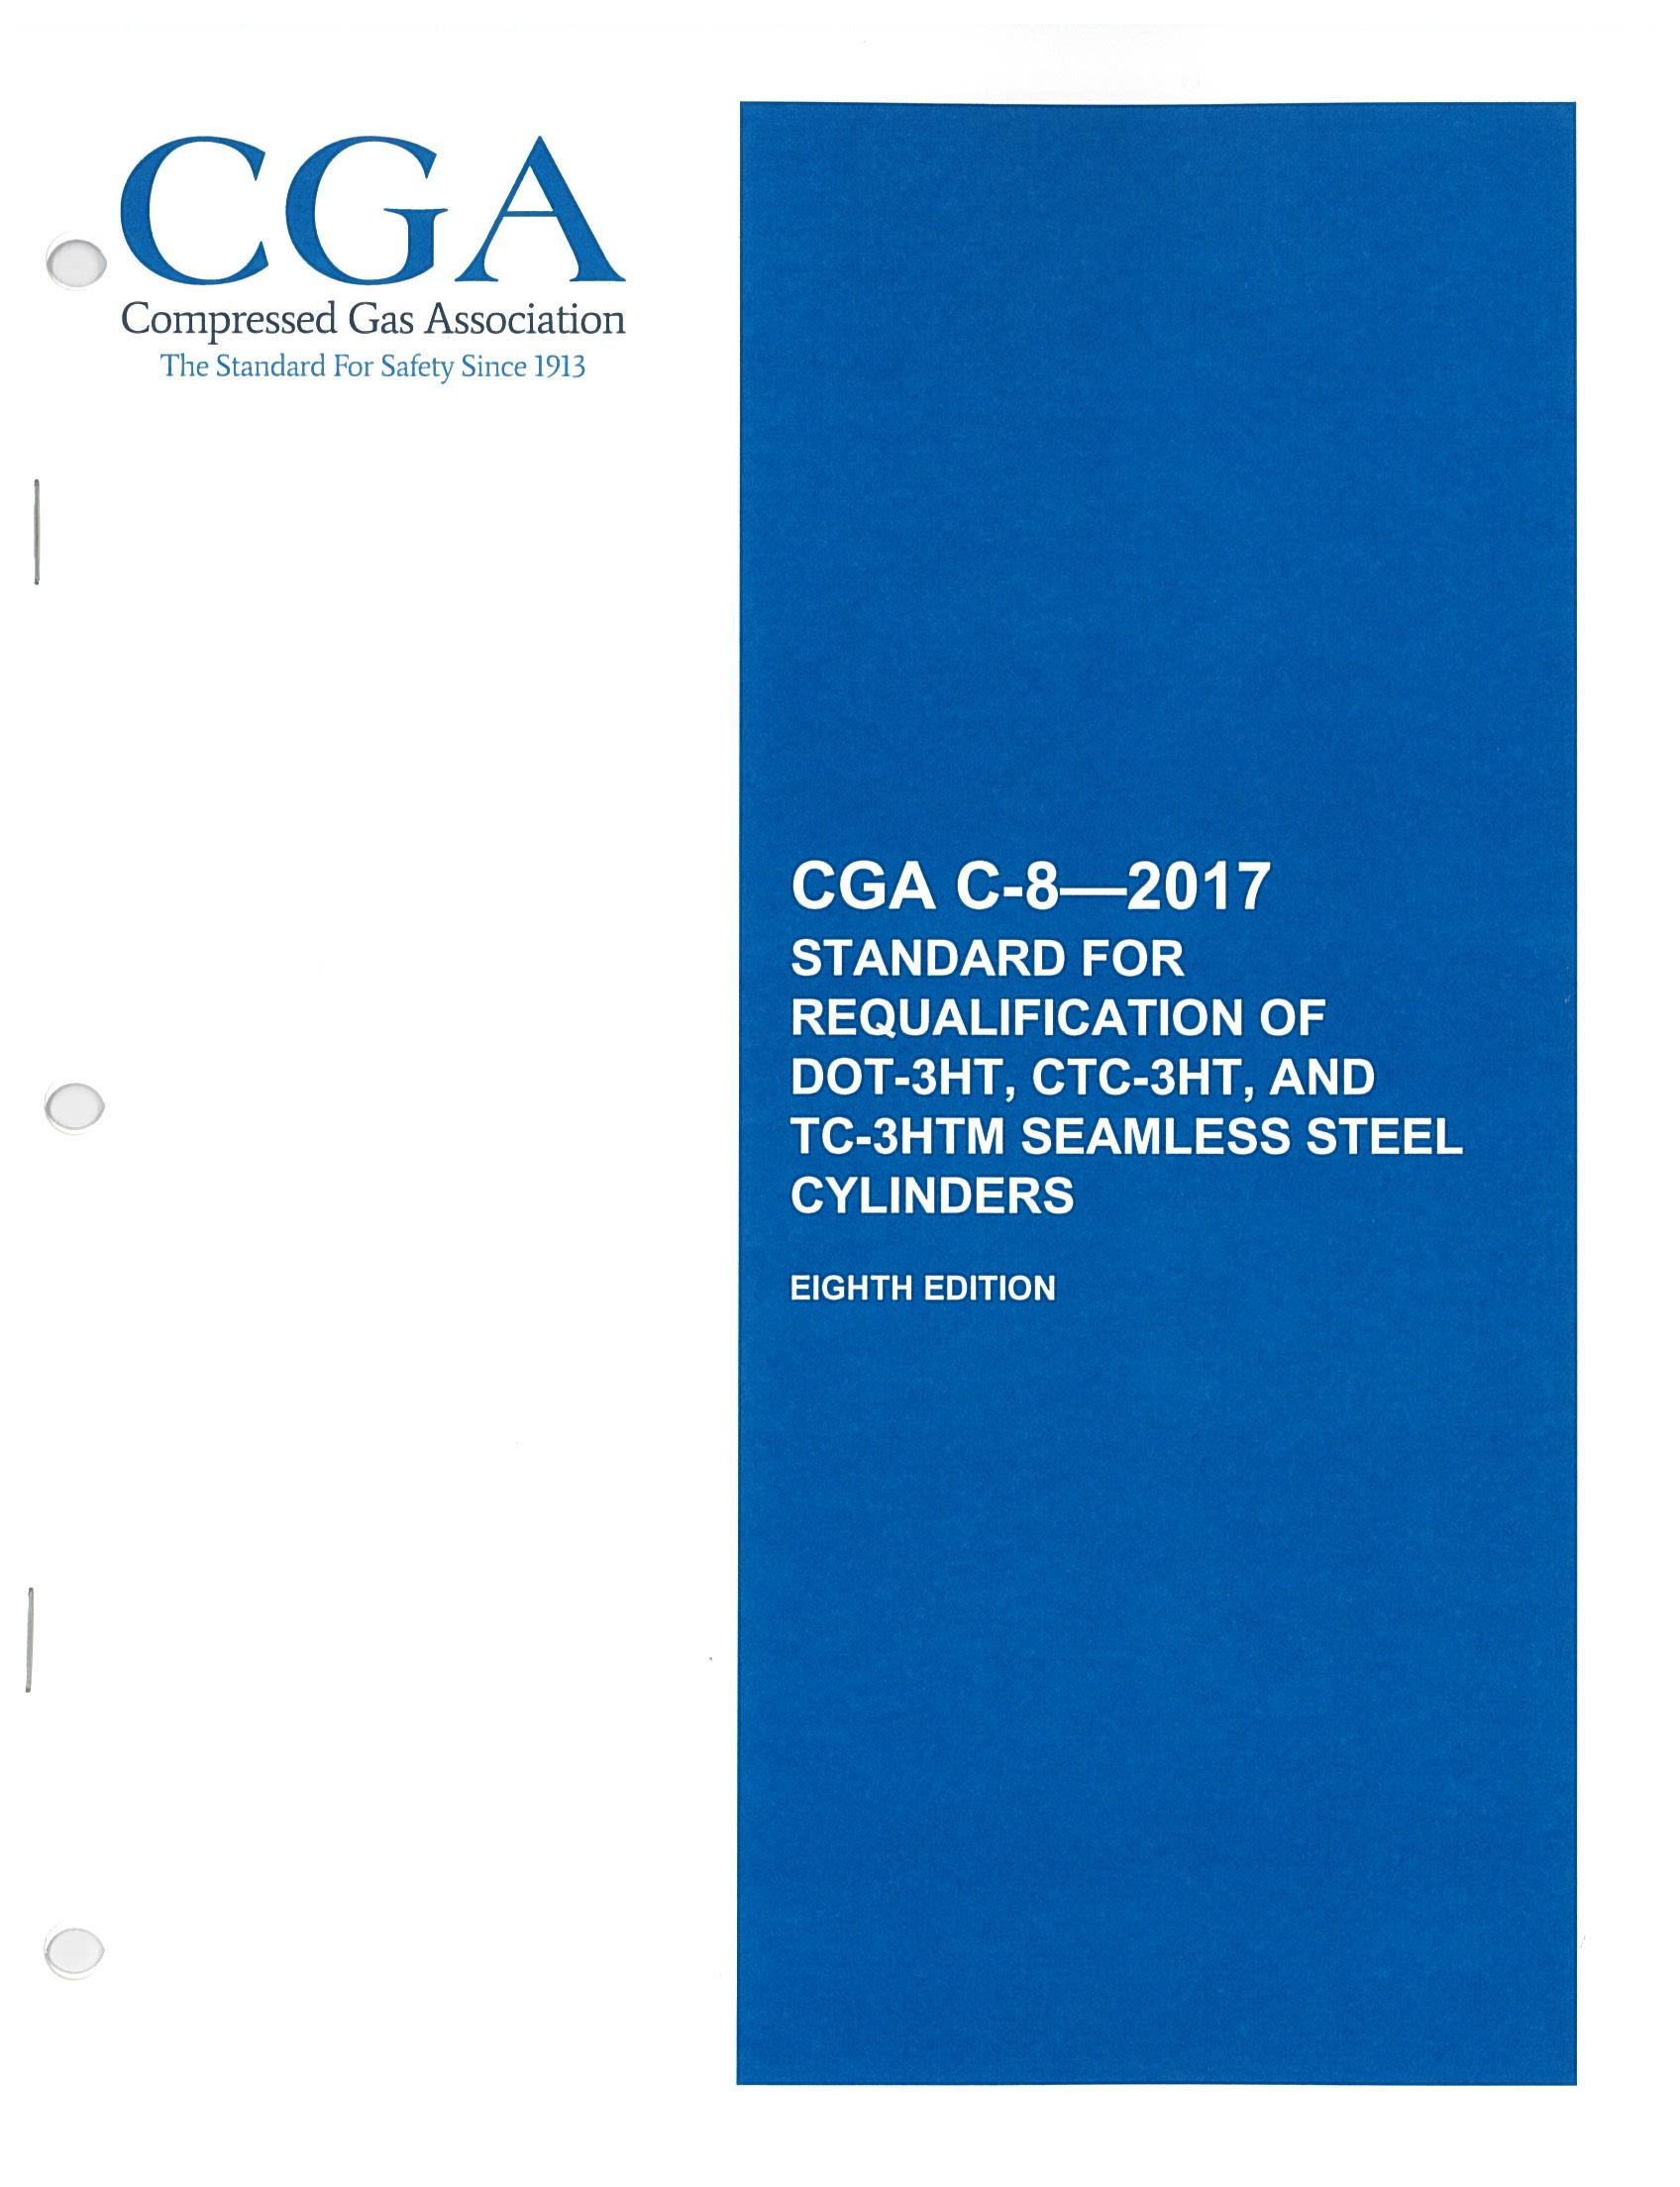 #393-308: CGA PAMPHLET C-8